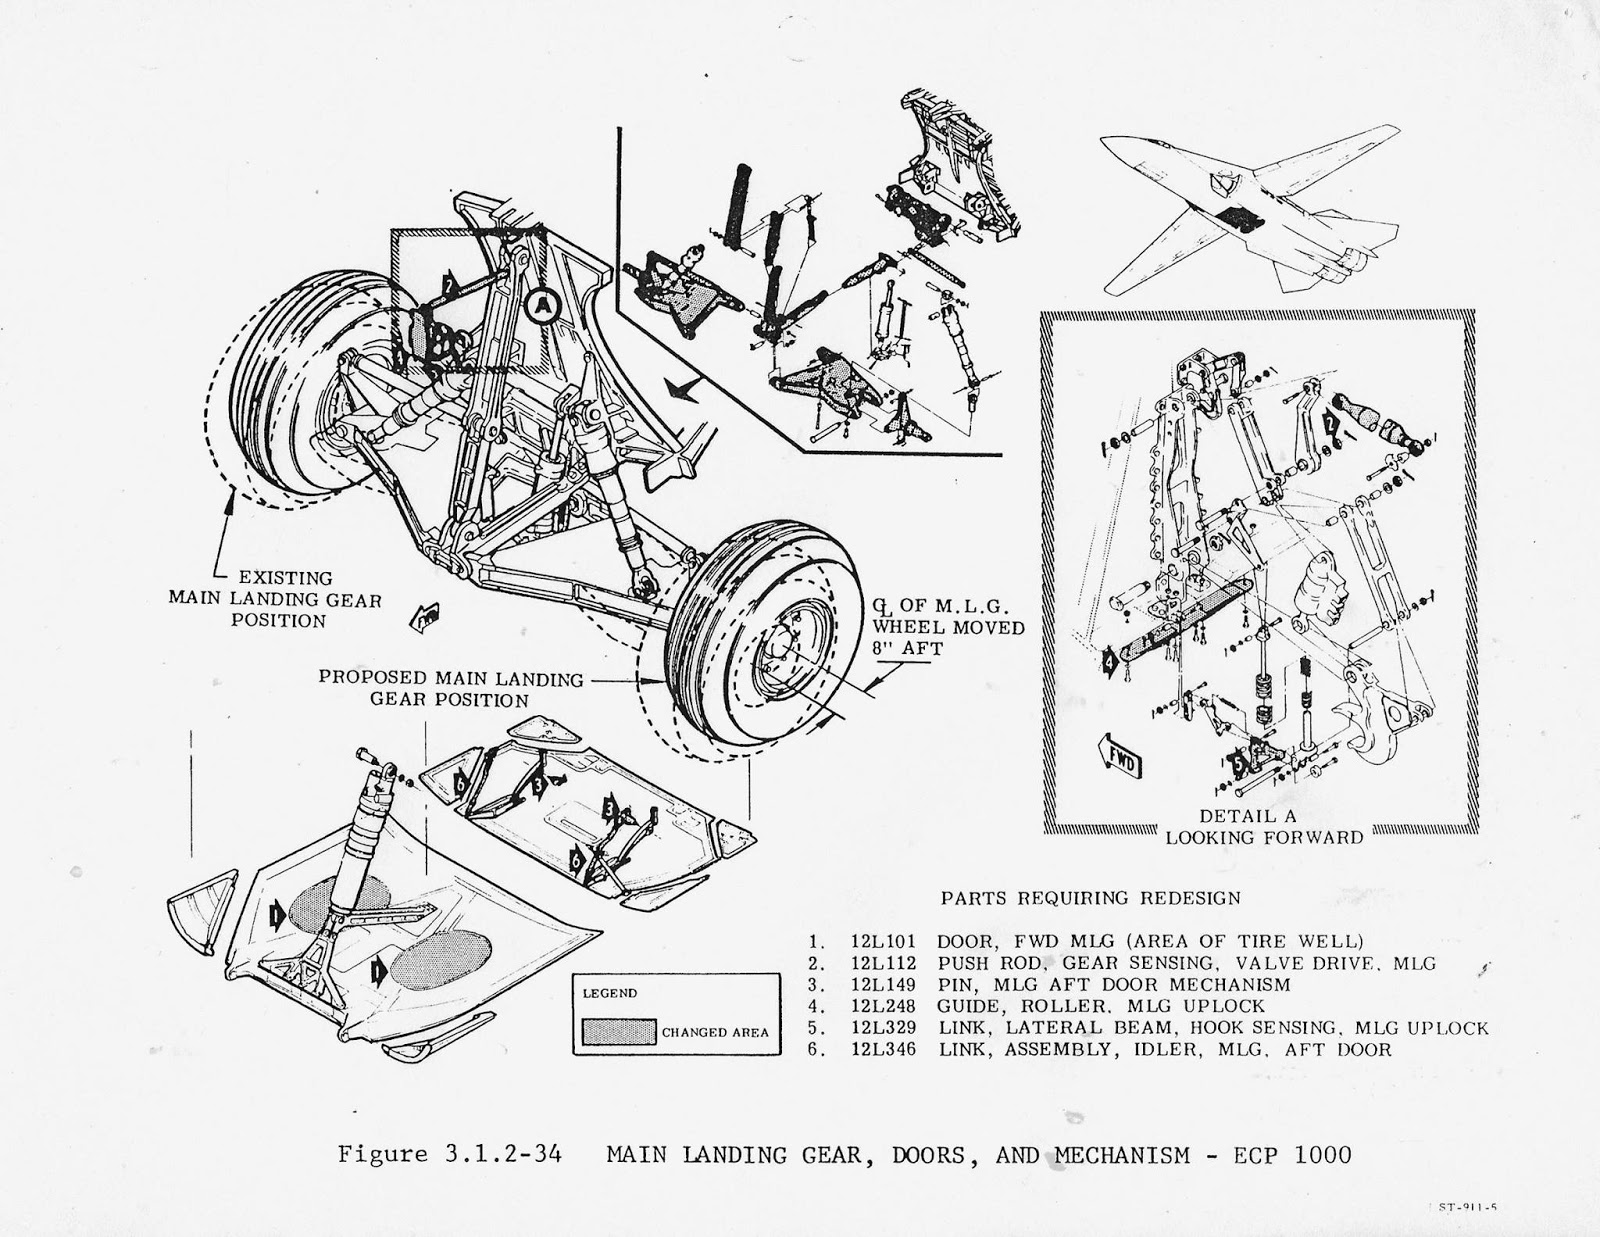 Tailhook Topics: The F-111B Production Main Landing Gear